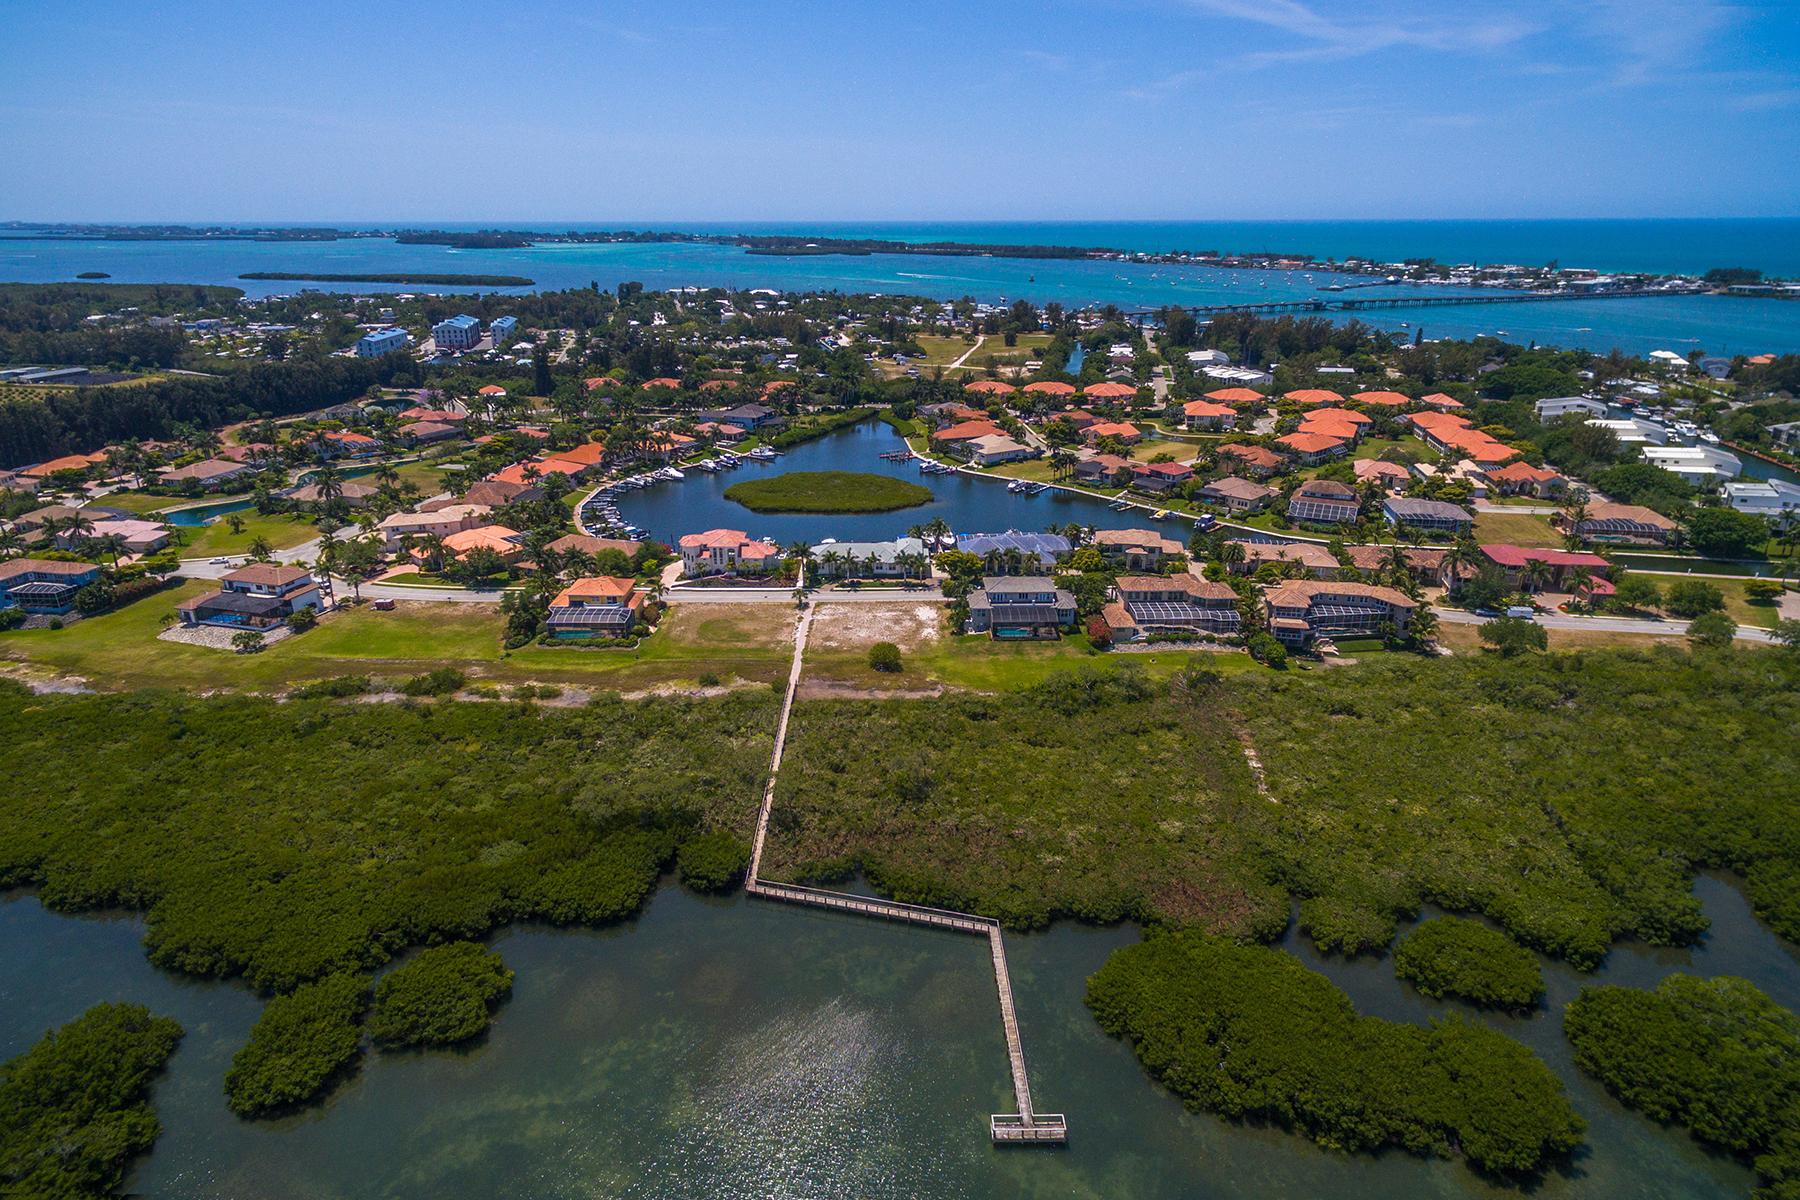 Land for Sale at HARBOUR LANDINGS ESTATES 12421 Baypointe Terr 28 Cortez, Florida 34215 United States